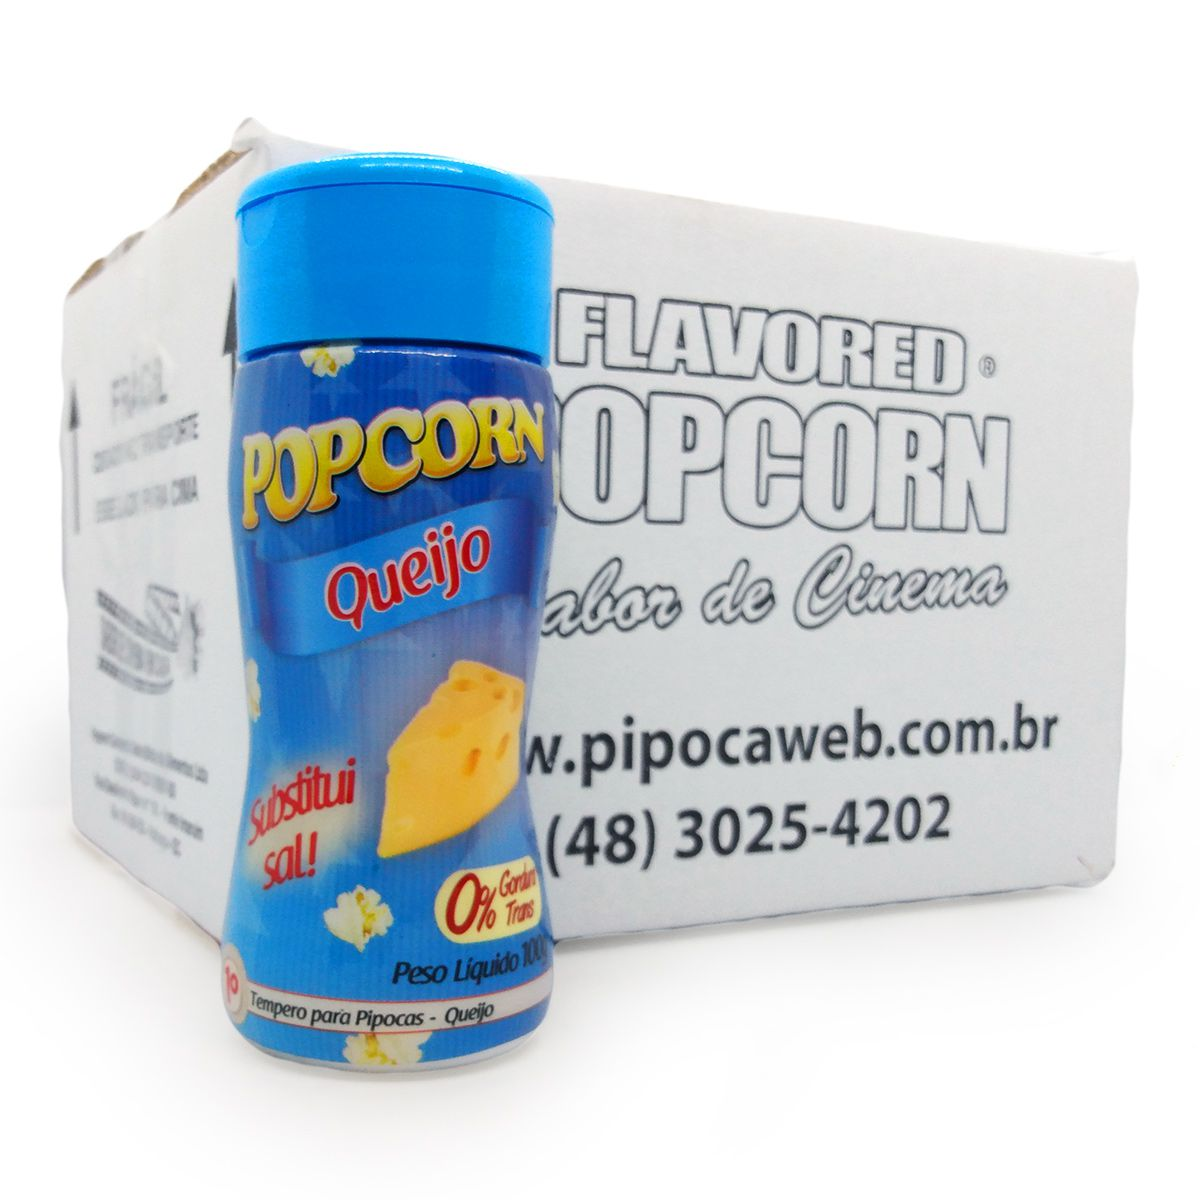 TEMPEROS P/ PIPOCA - SABOR QUEIJO 100g - Caixa c/ 12 un - R$ 7,66 cada